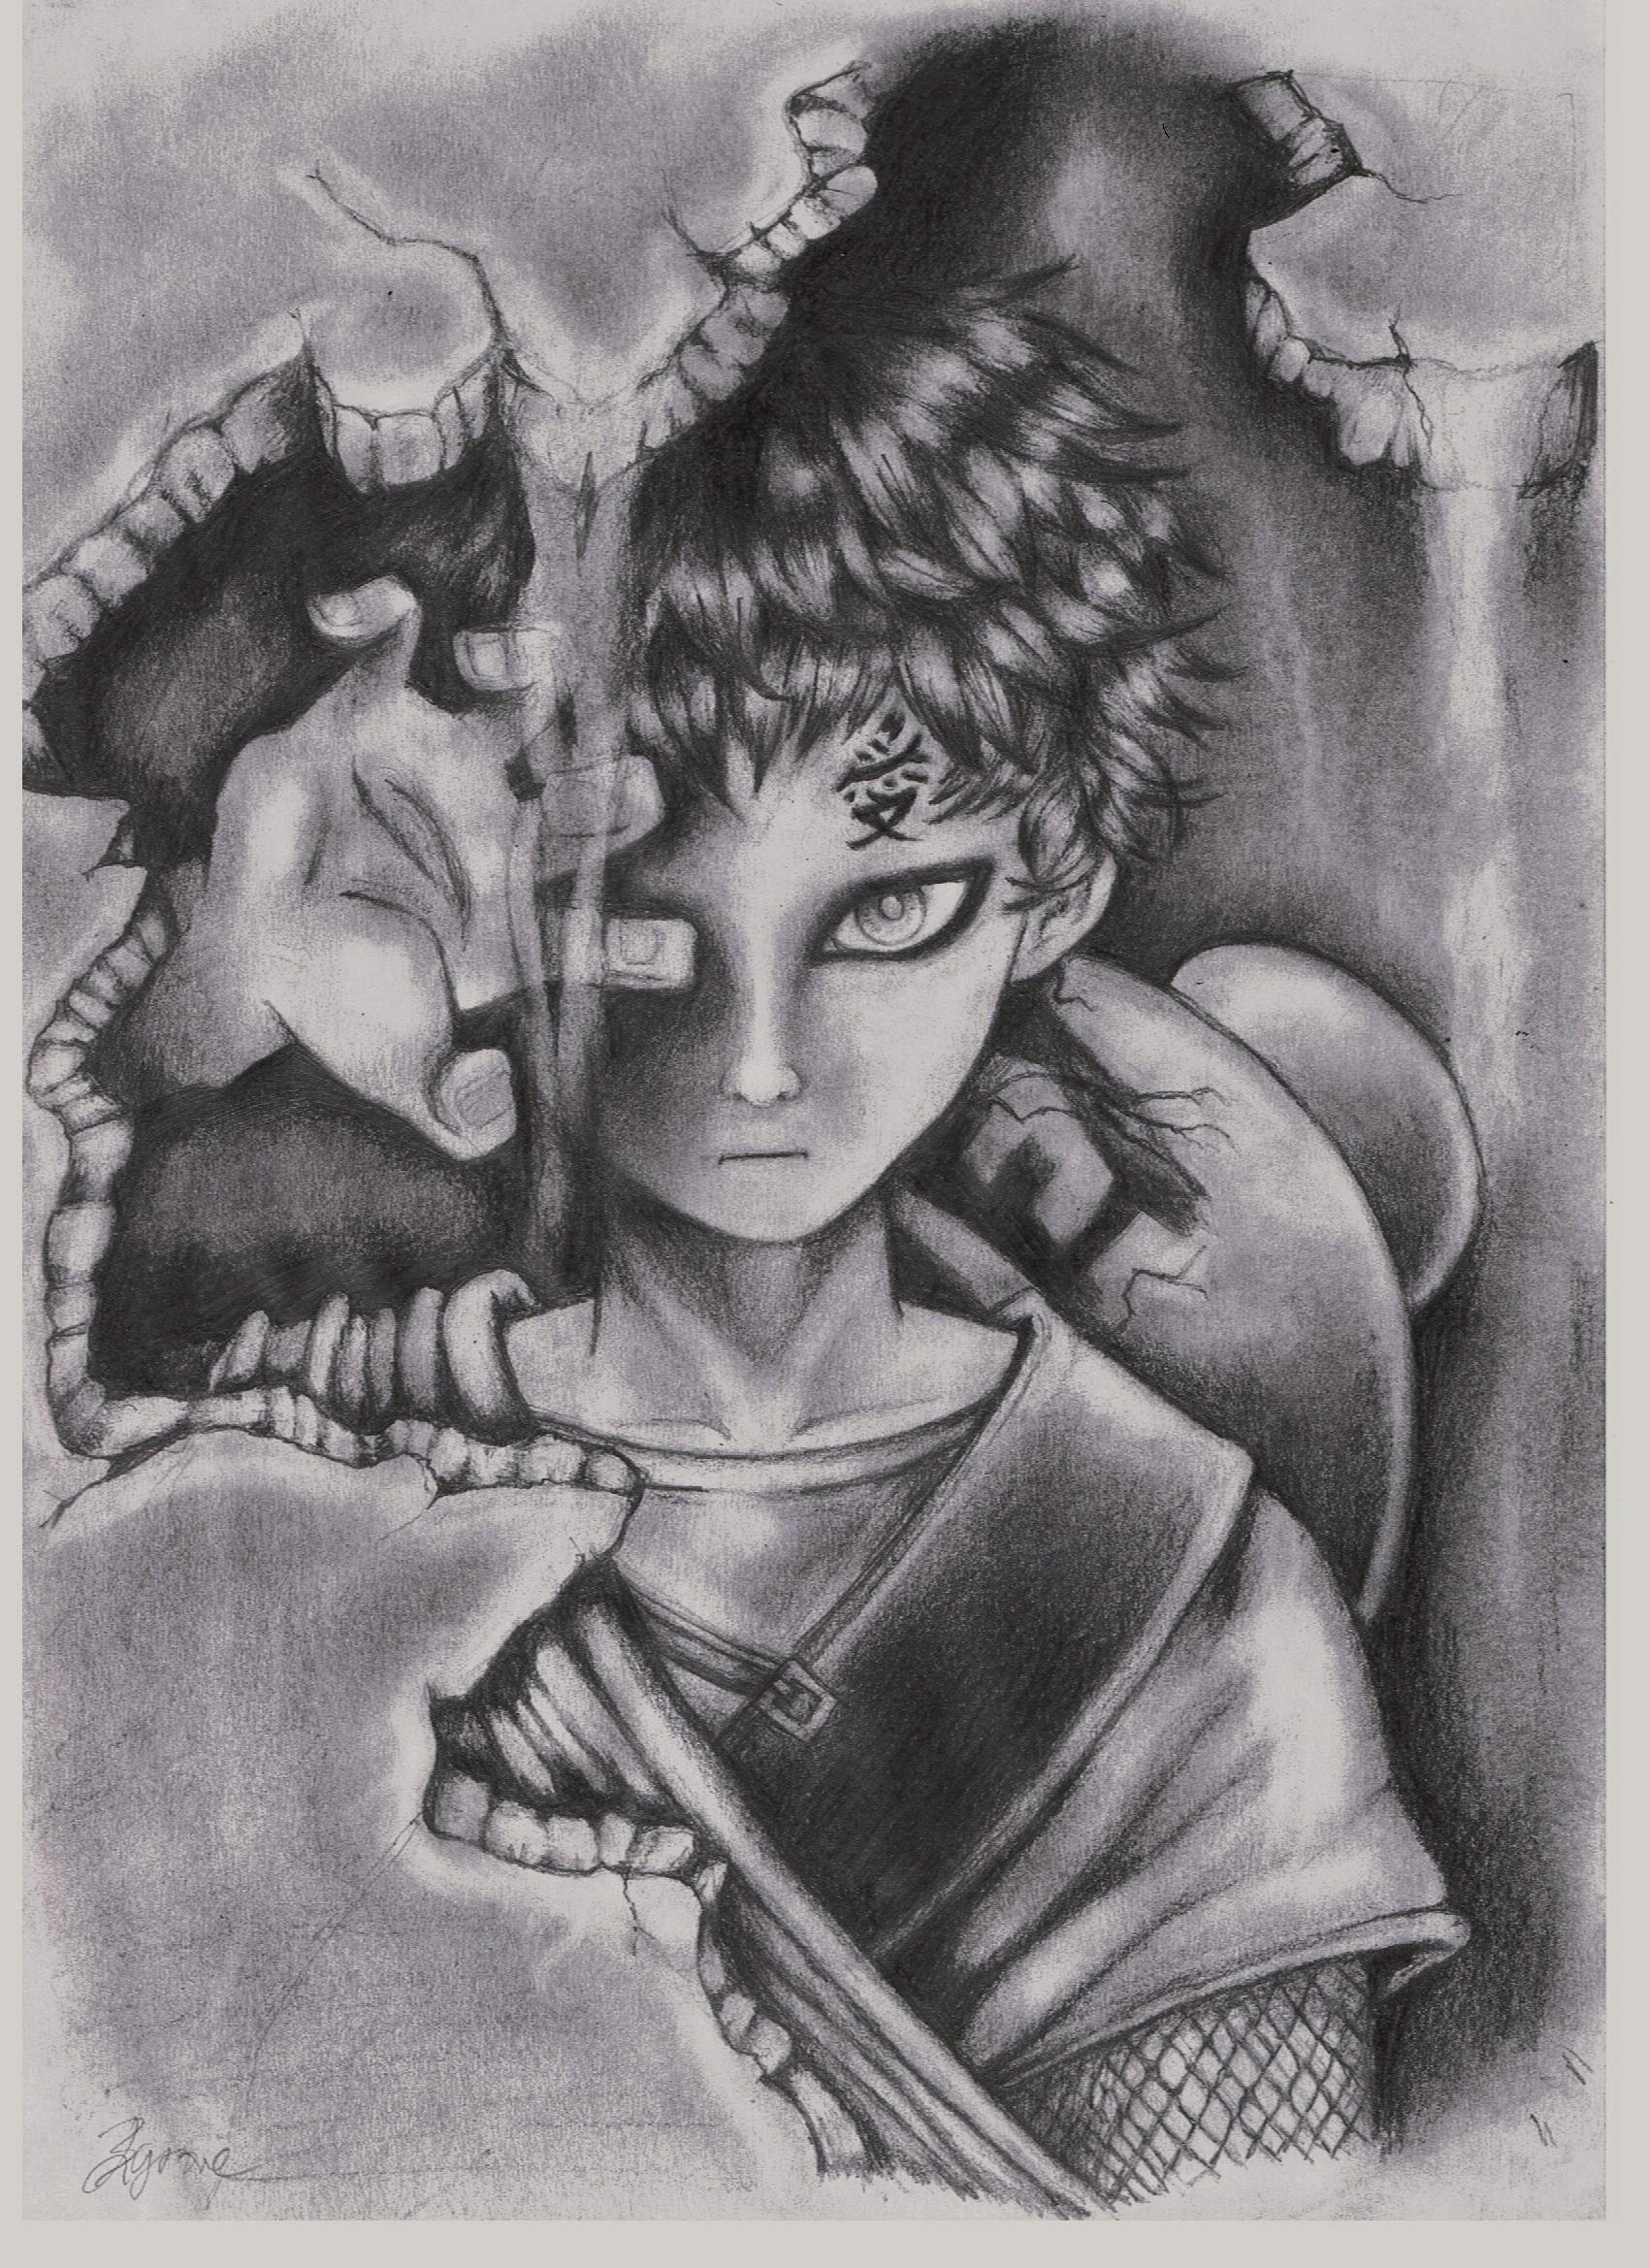 Gaara naruto sketch